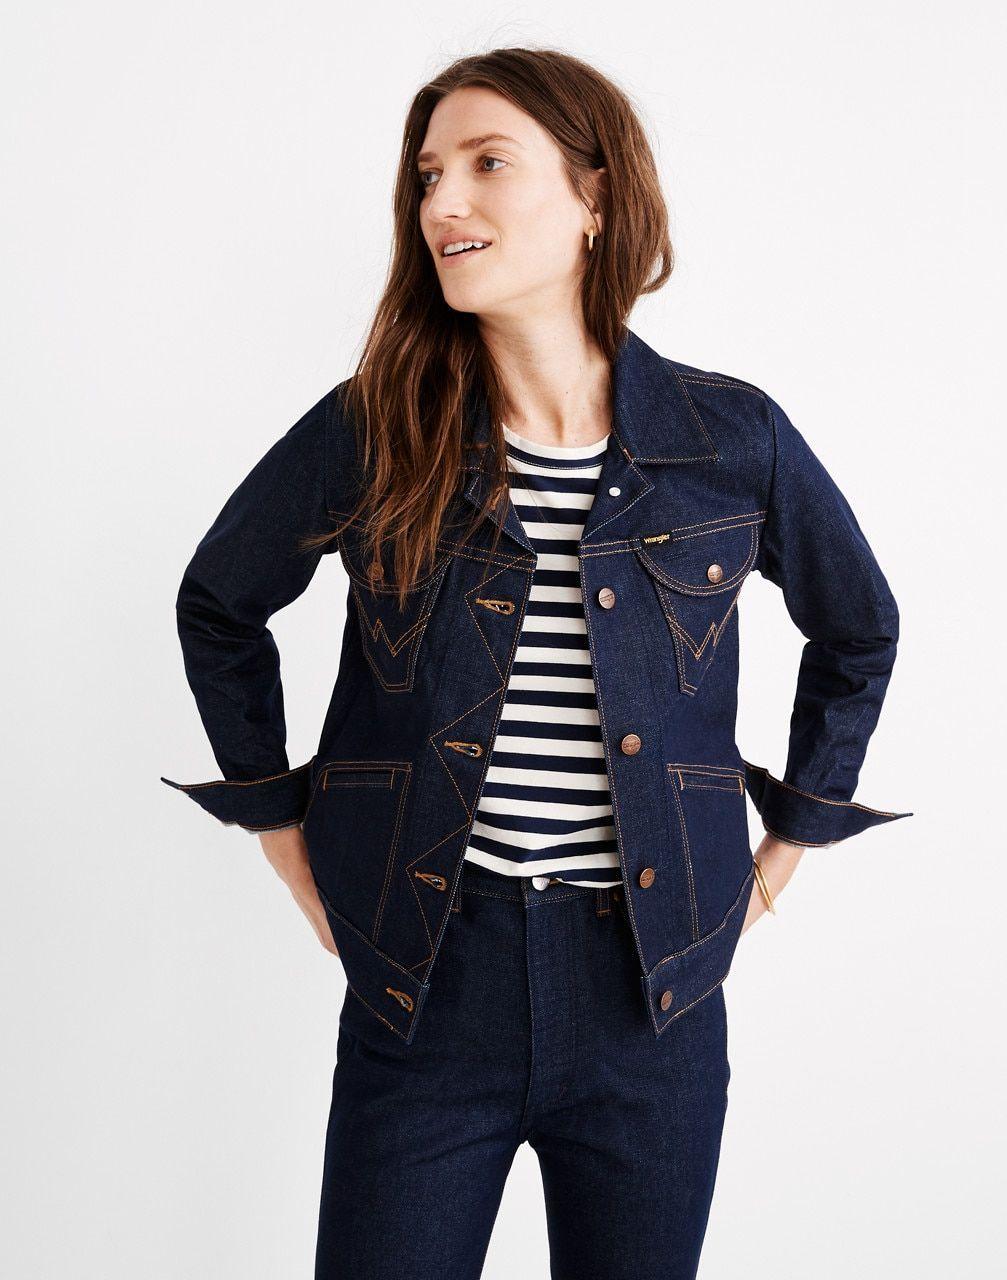 Women S Wrangler Icons Jean Jacket Jean Jacket For Girls Dark Denim Jacket Outfit Jackets [ 1280 x 1007 Pixel ]